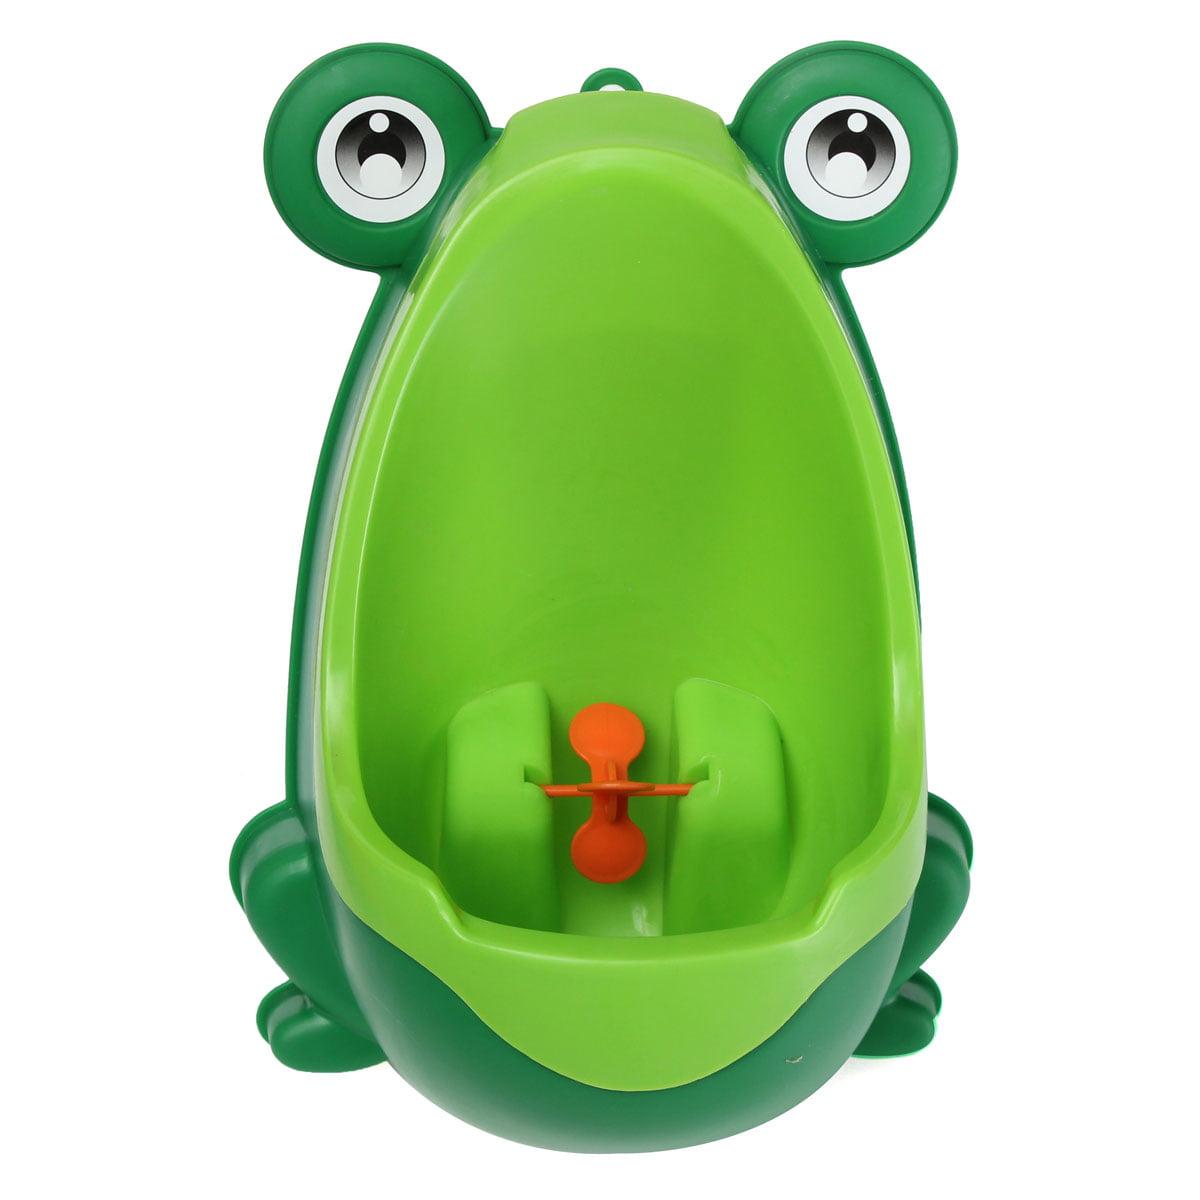 Frog Boy Kids Baby Toilet Training Children Potty Pee Urine Removable For Home Bathroom+ Brush